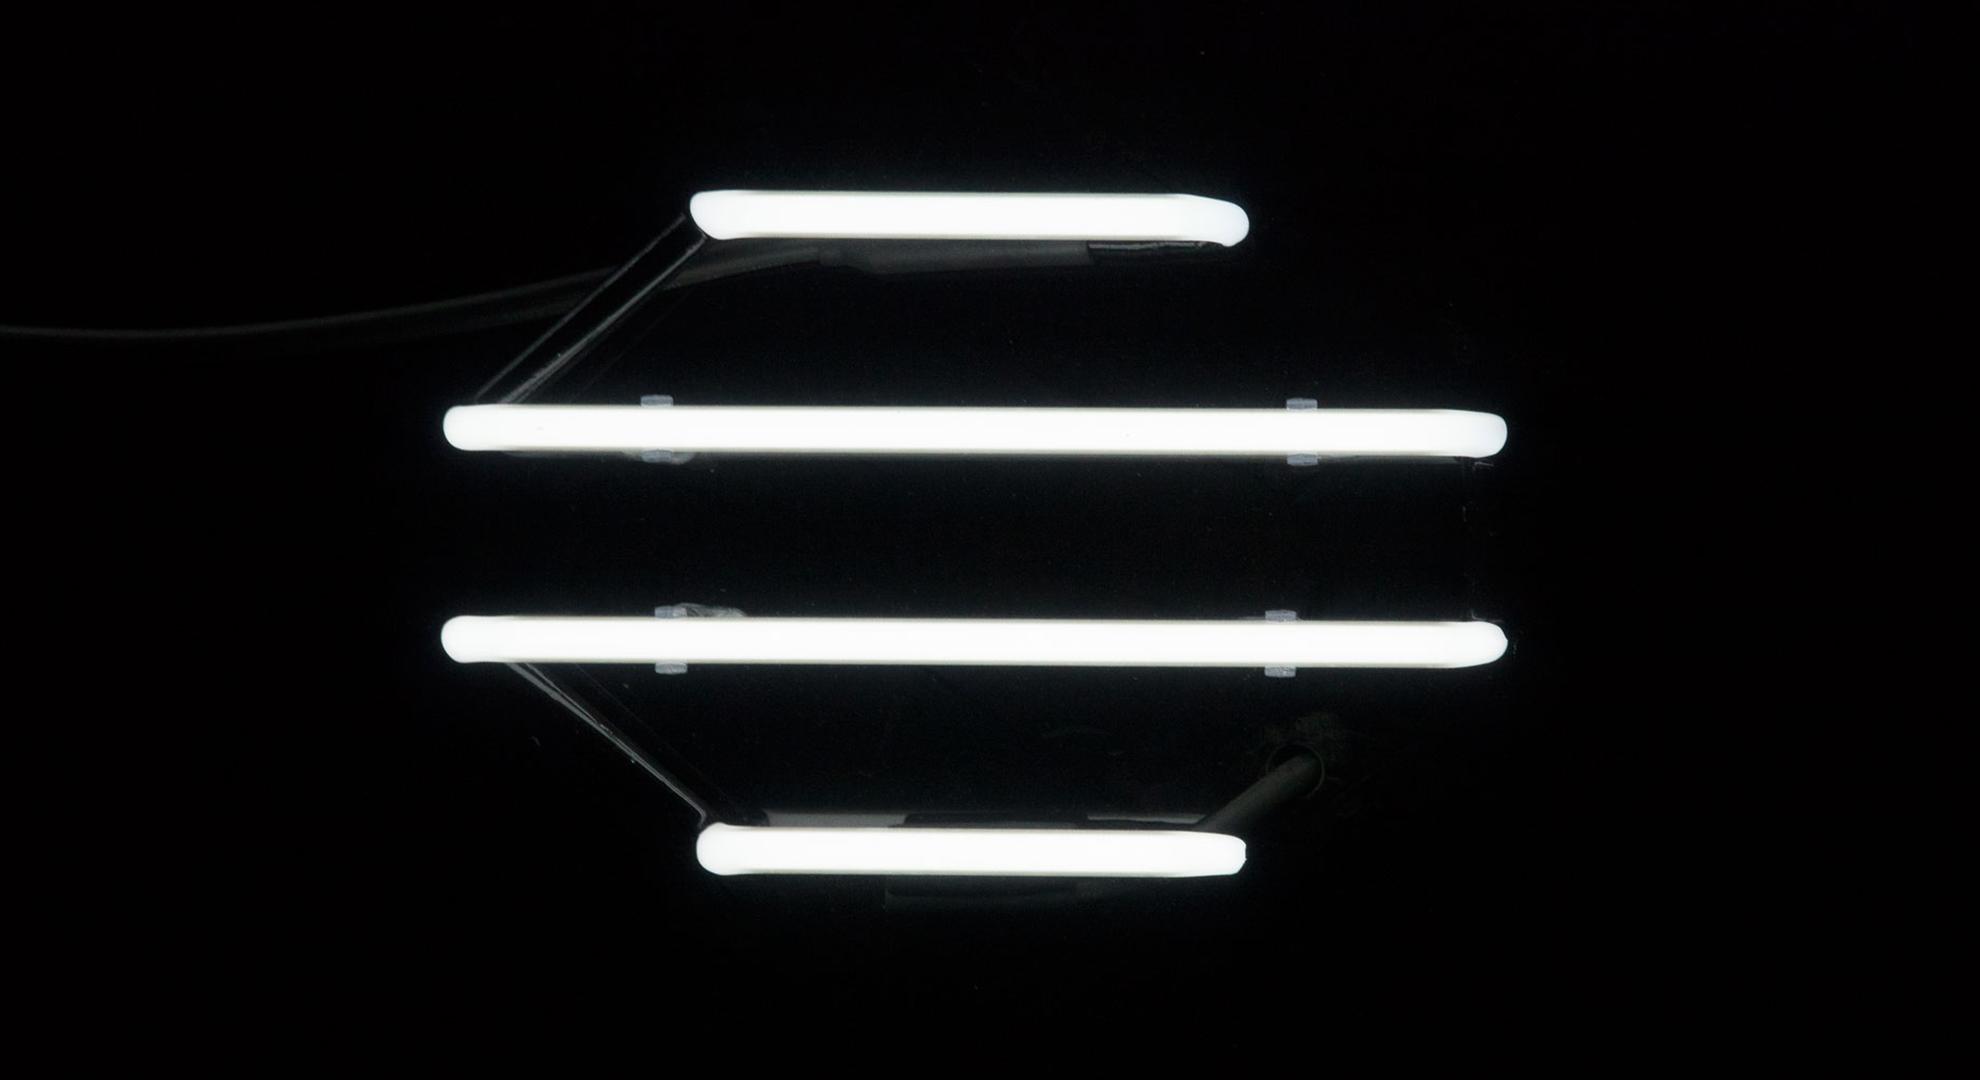 alix+neyvoz+nocturnes+musée+art+contemporain+neon+design+party+2.jpg